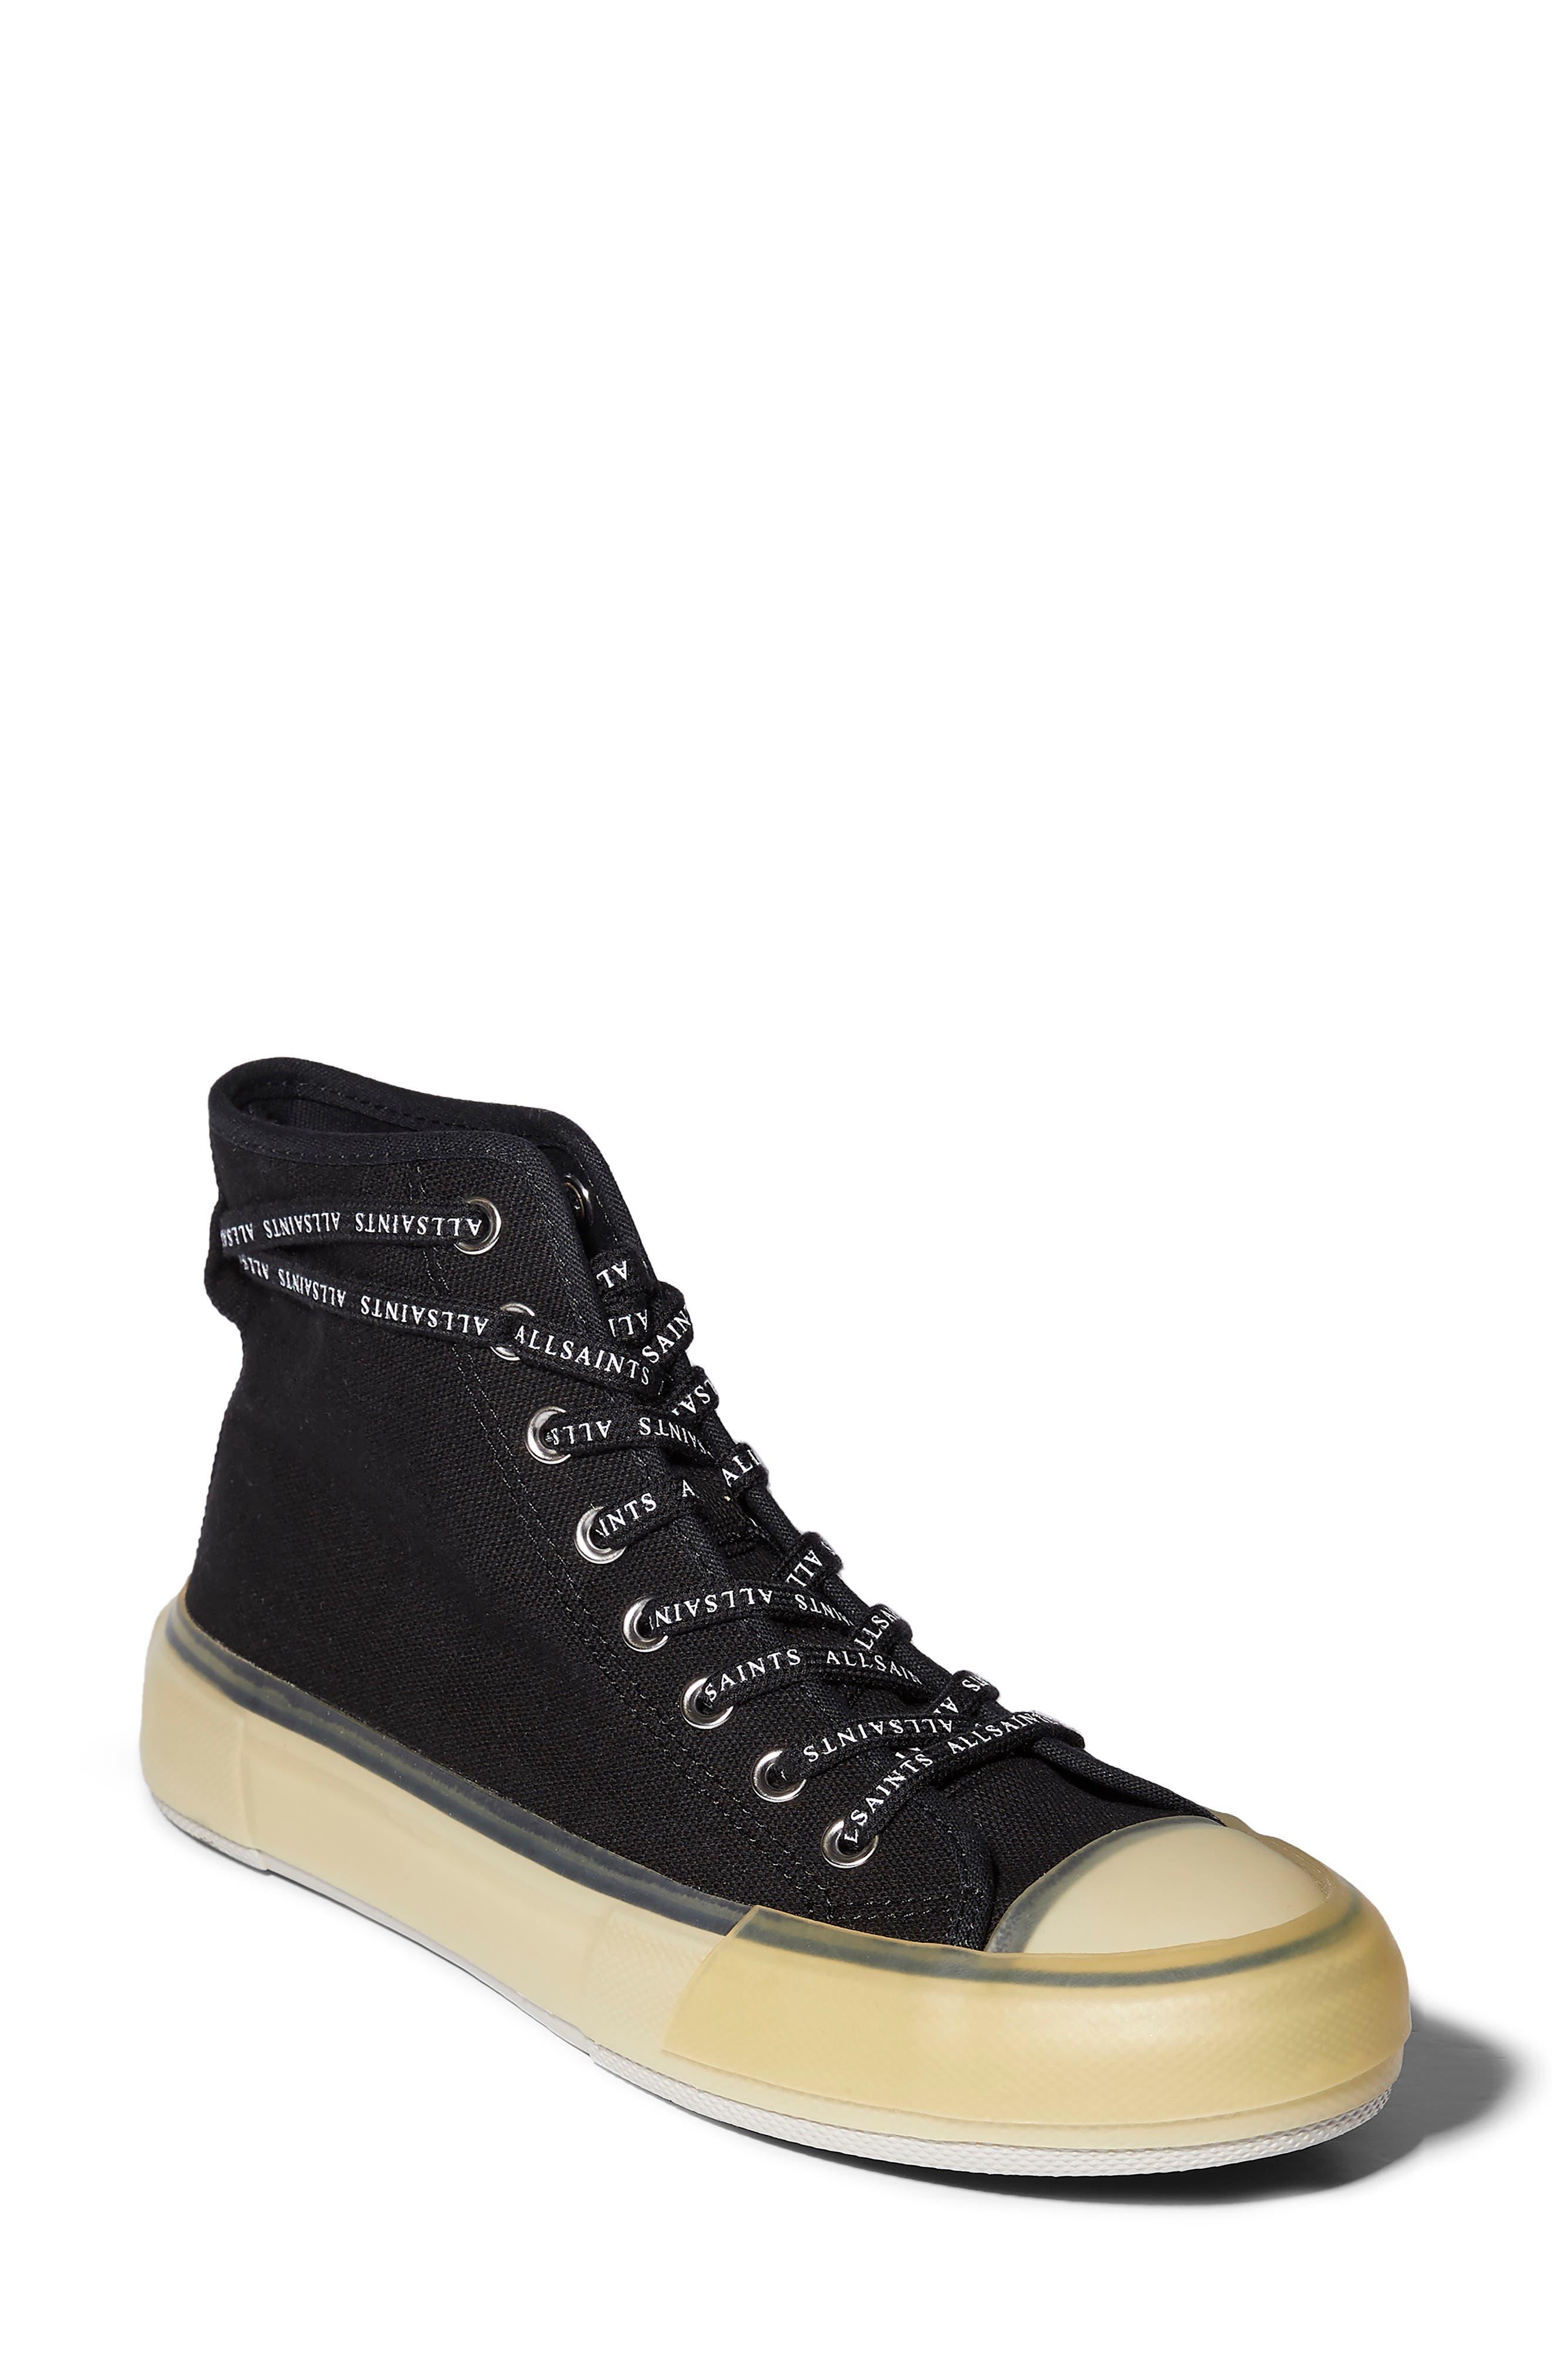 Jaxal Canvas High Top Sneaker